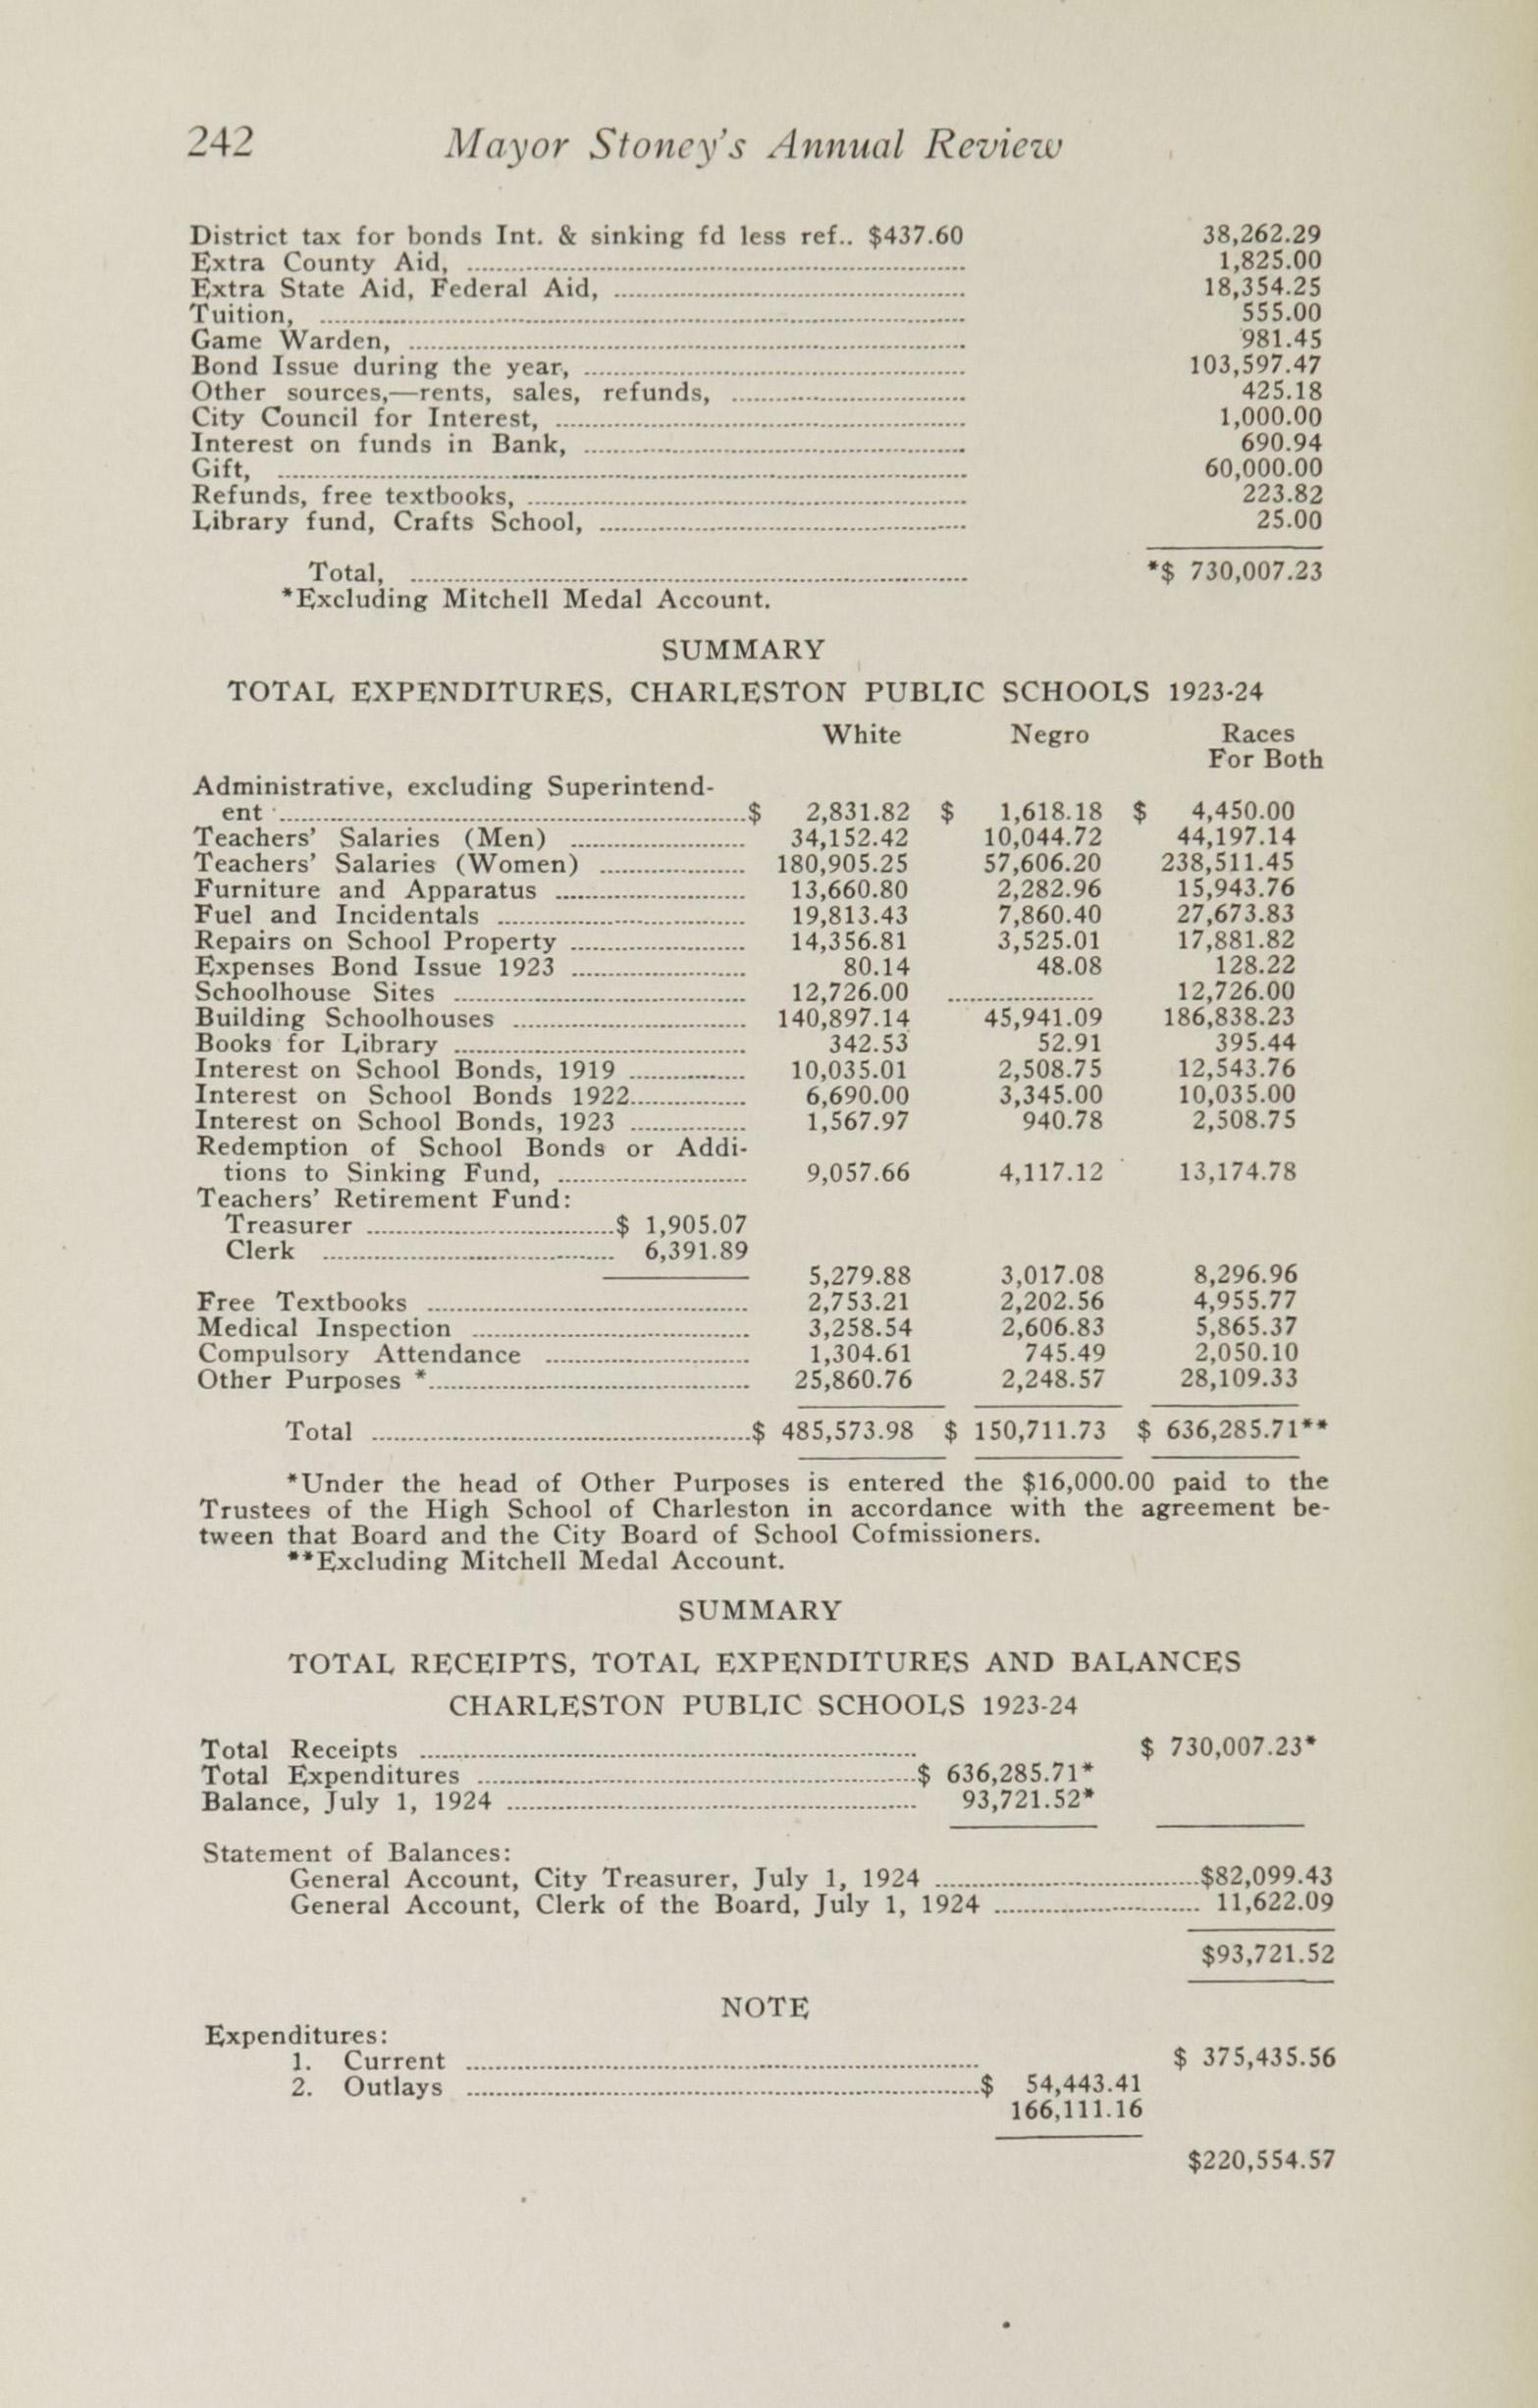 Charleston Yearbook, 1924, page 242